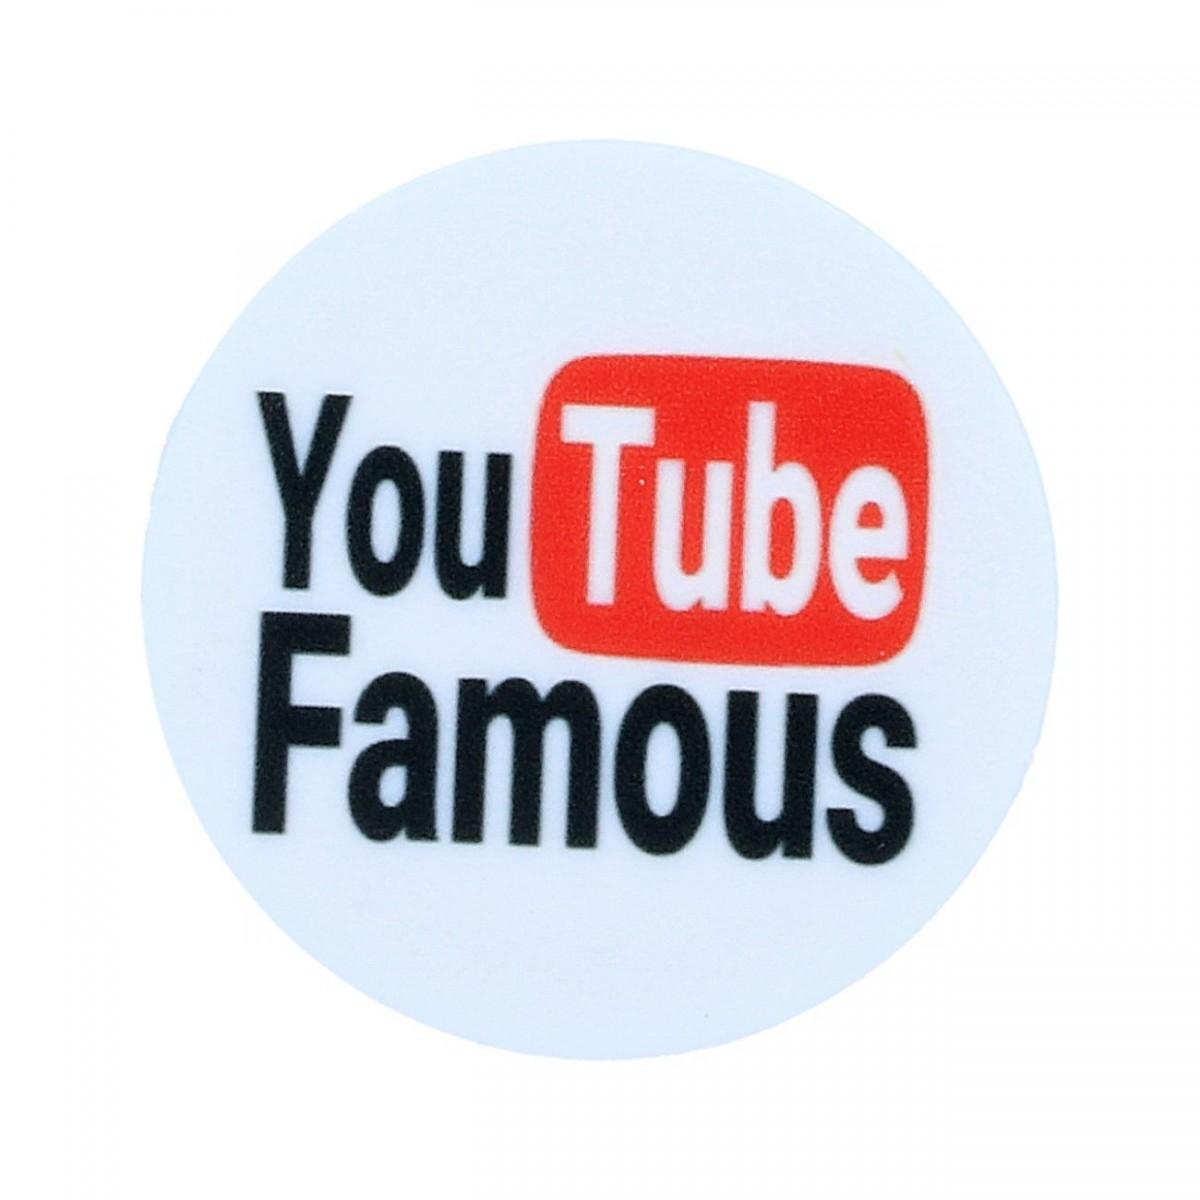 Držák PopSocket YouTube Famous